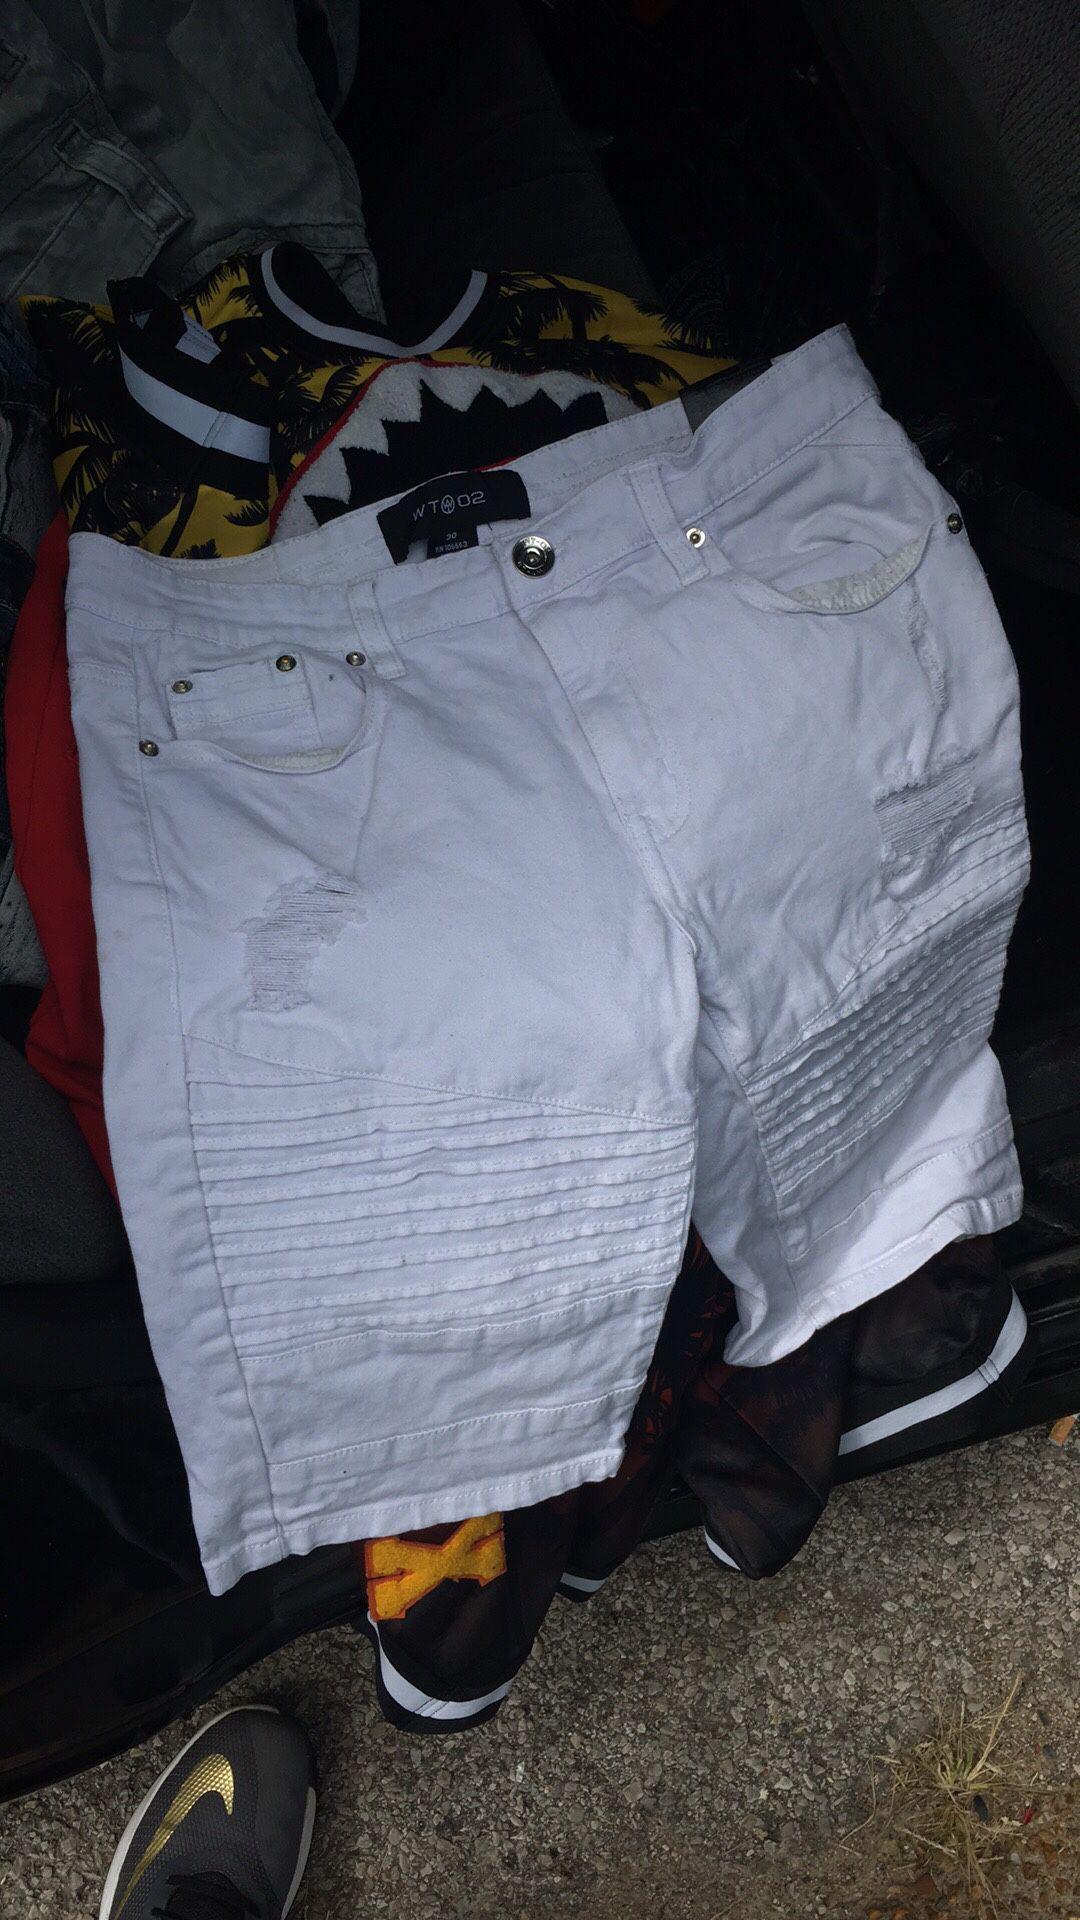 Grindhouse pants